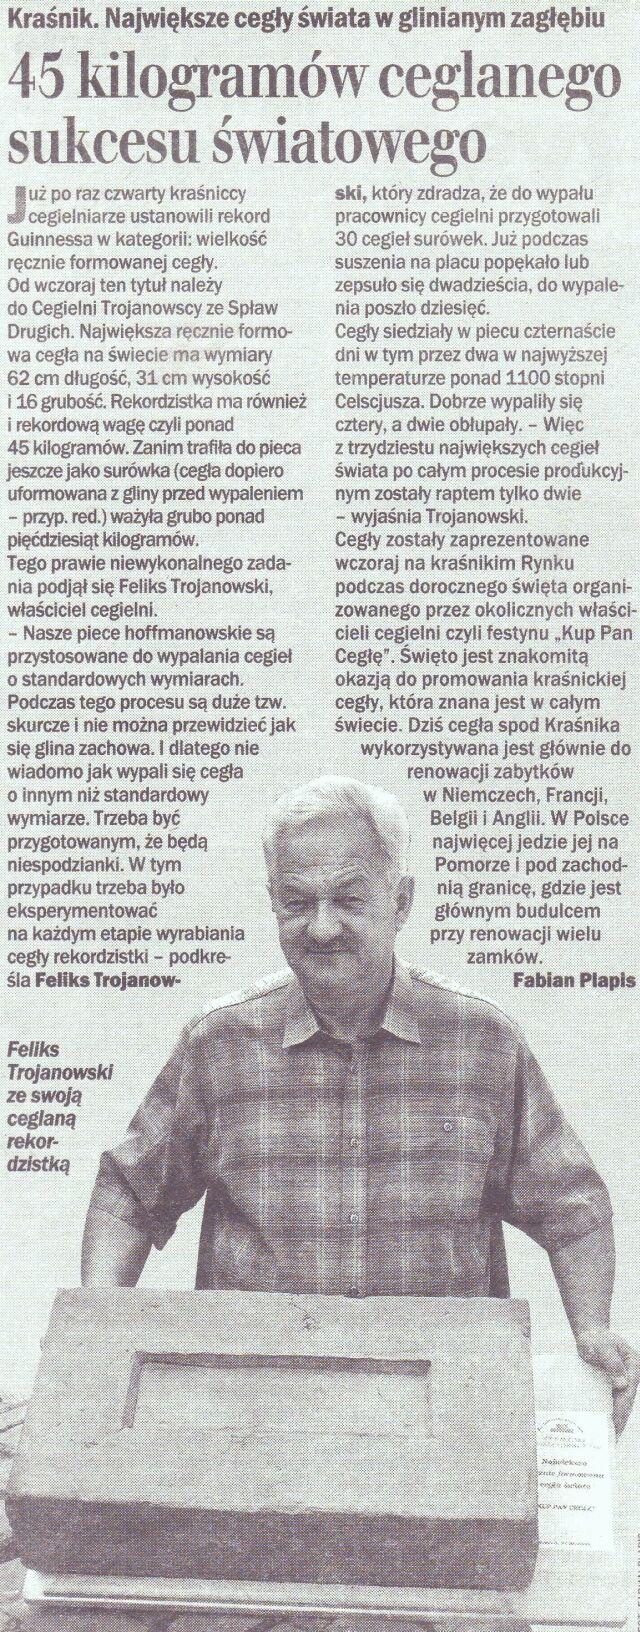 """Dziennik Lubelski"" Nr 194, 21 Sierpień 2006"